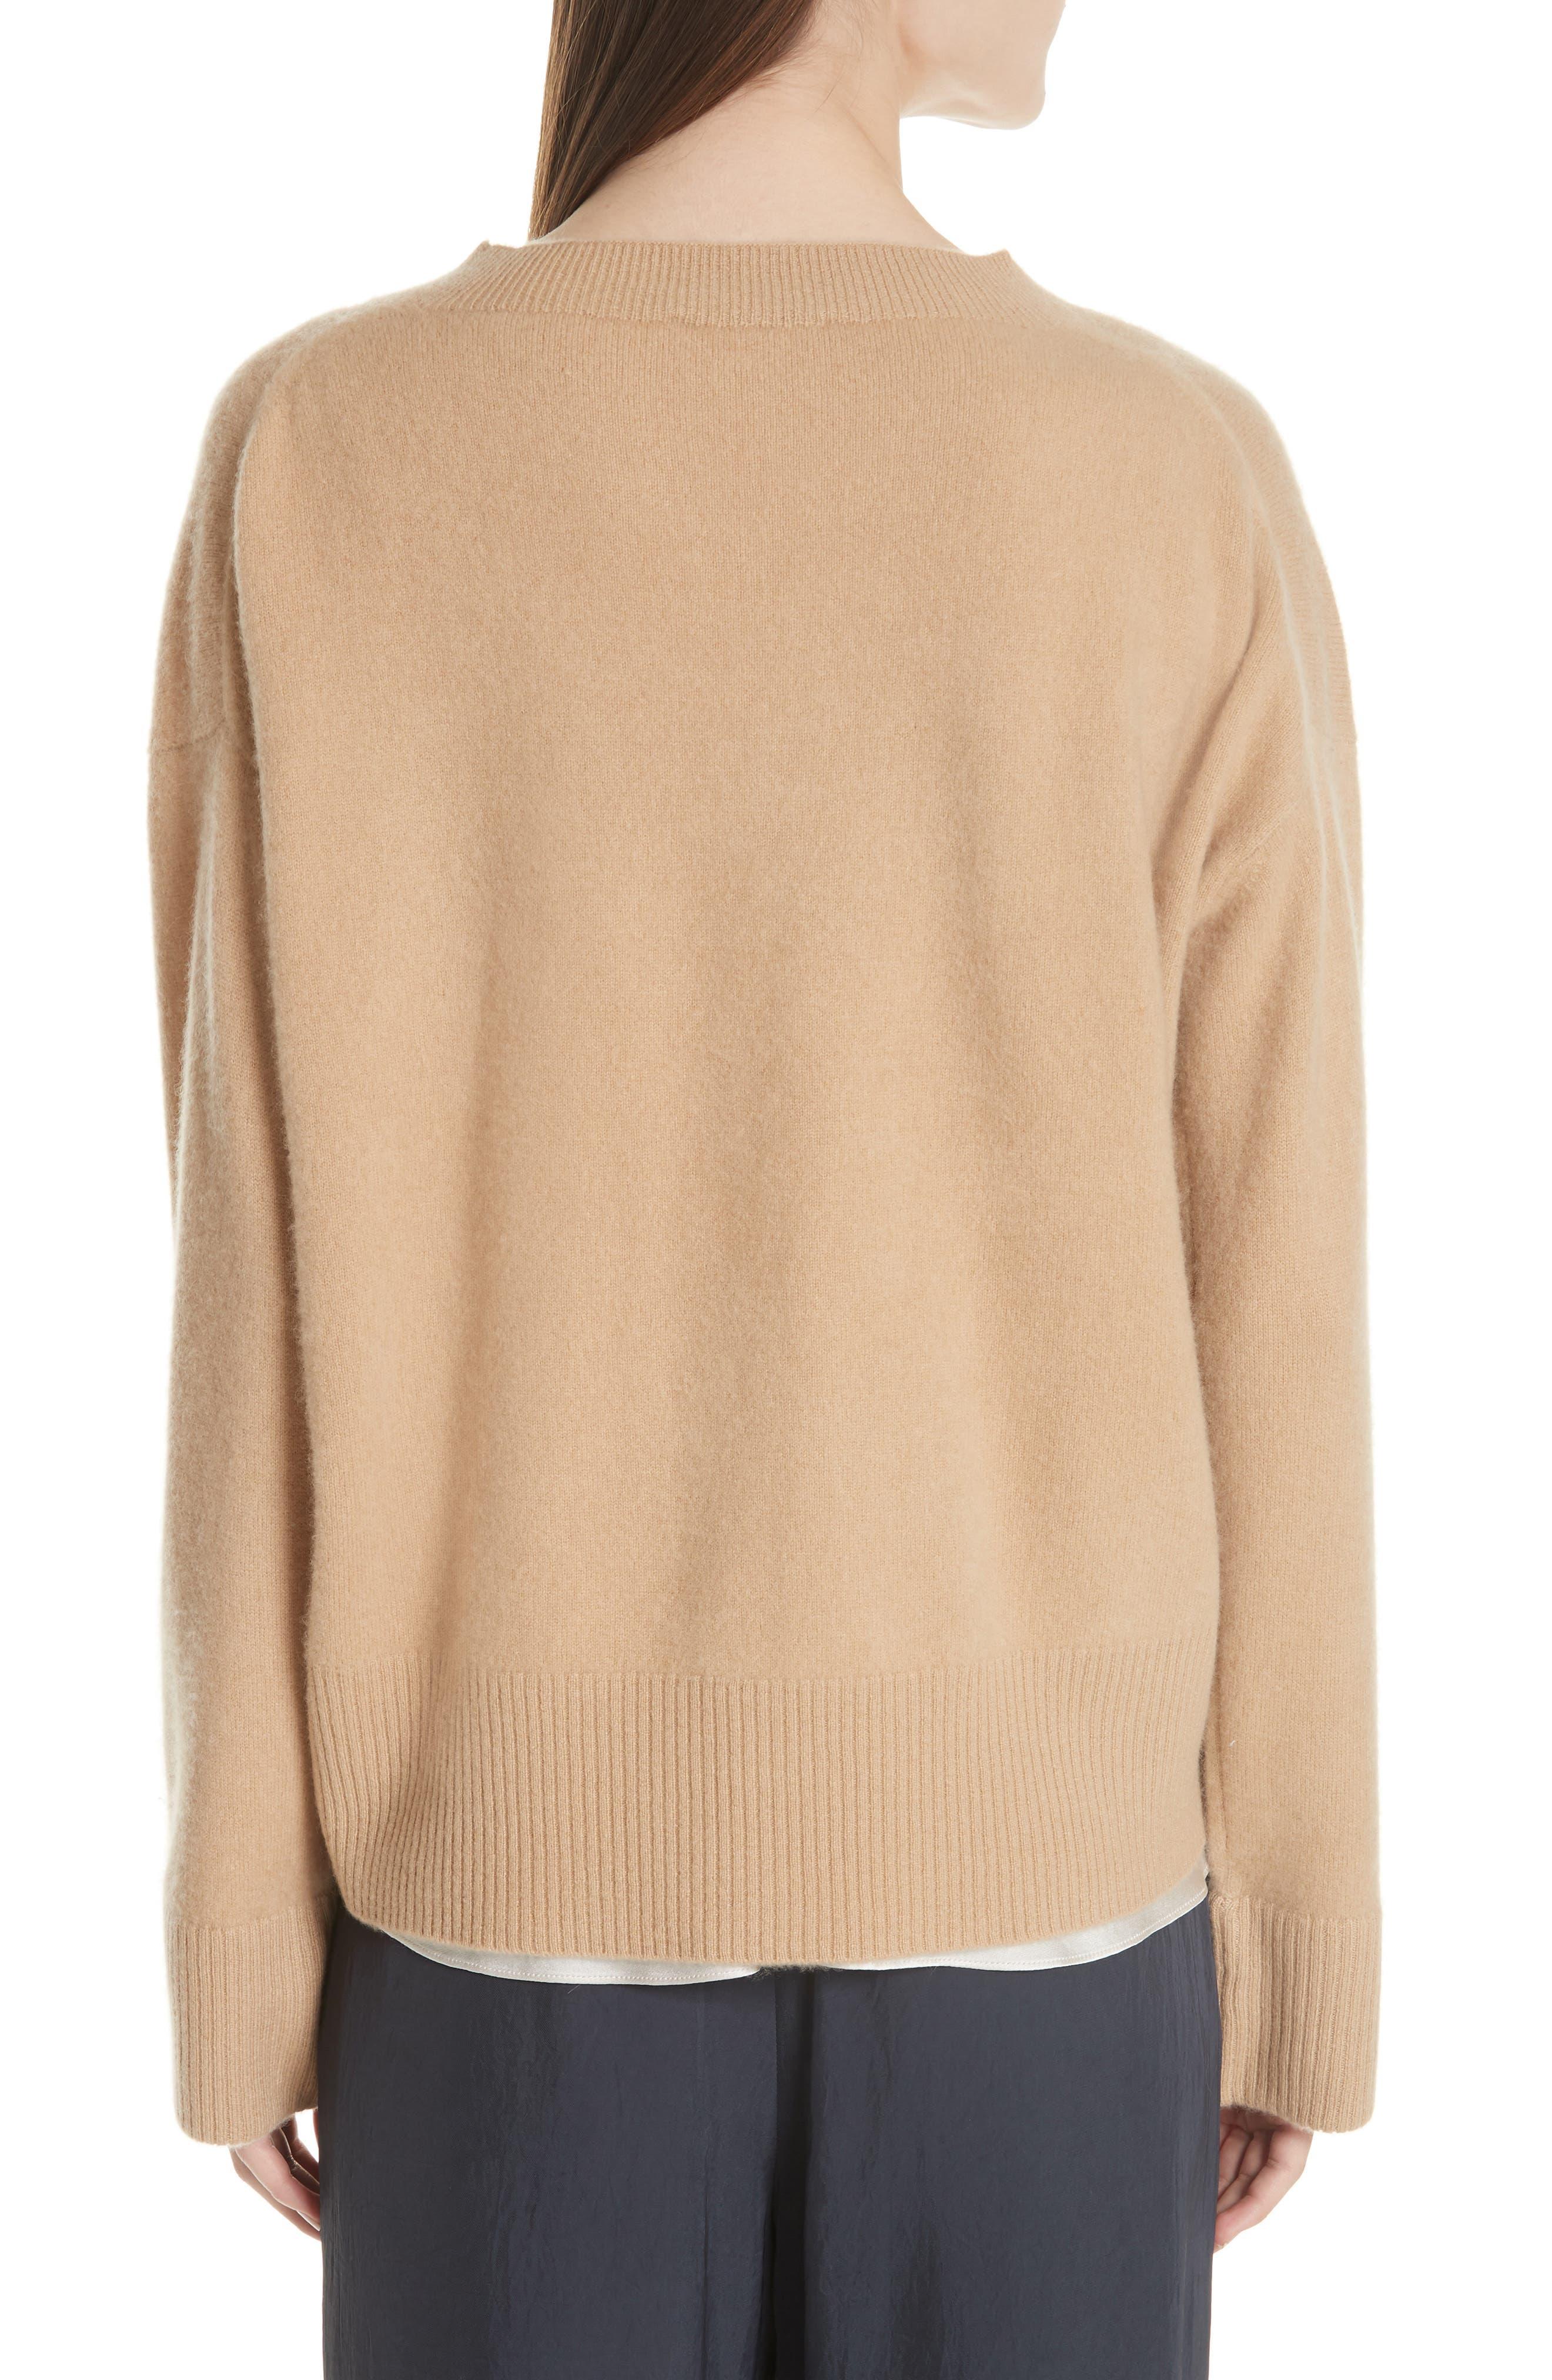 Cashmere Oversize Sweater,                             Alternate thumbnail 2, color,                             203